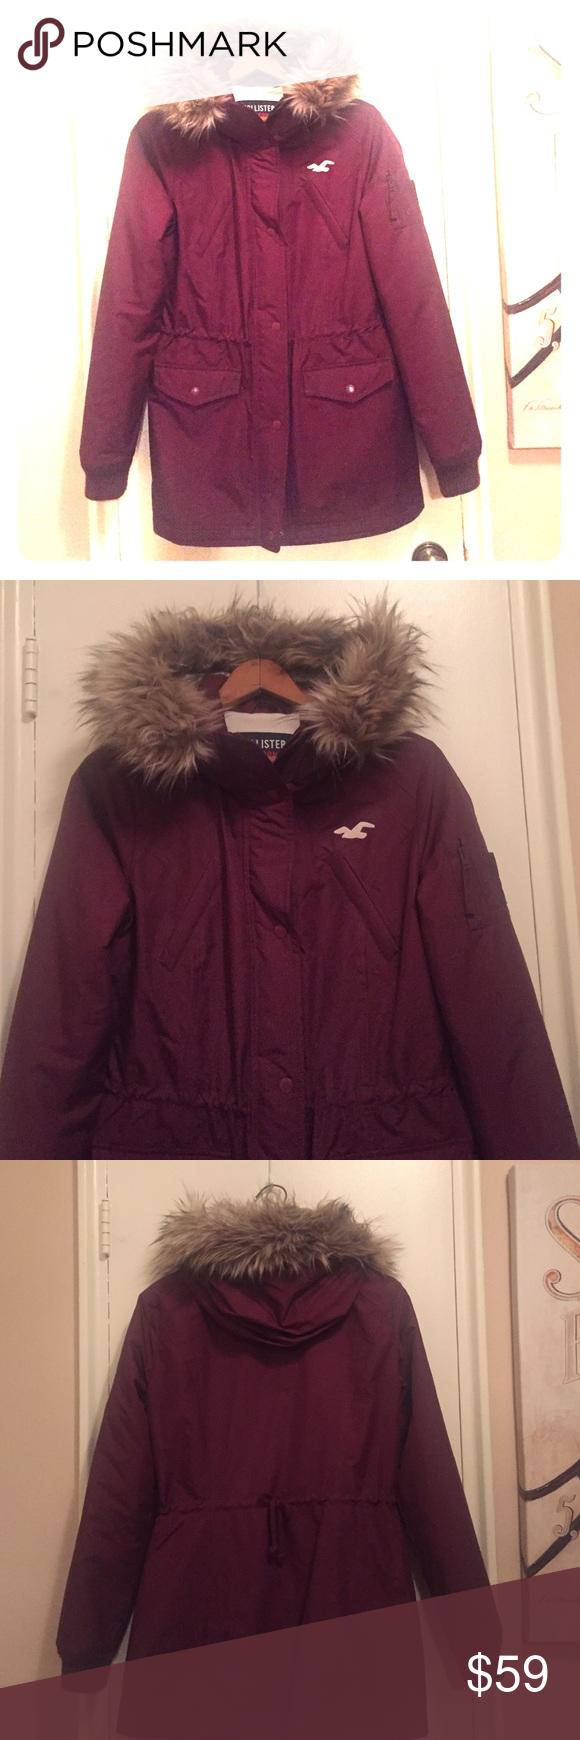 Hollister Burgundy Winter Jacket Winter Jackets Clothes Design All Weather Jackets [ 1740 x 580 Pixel ]